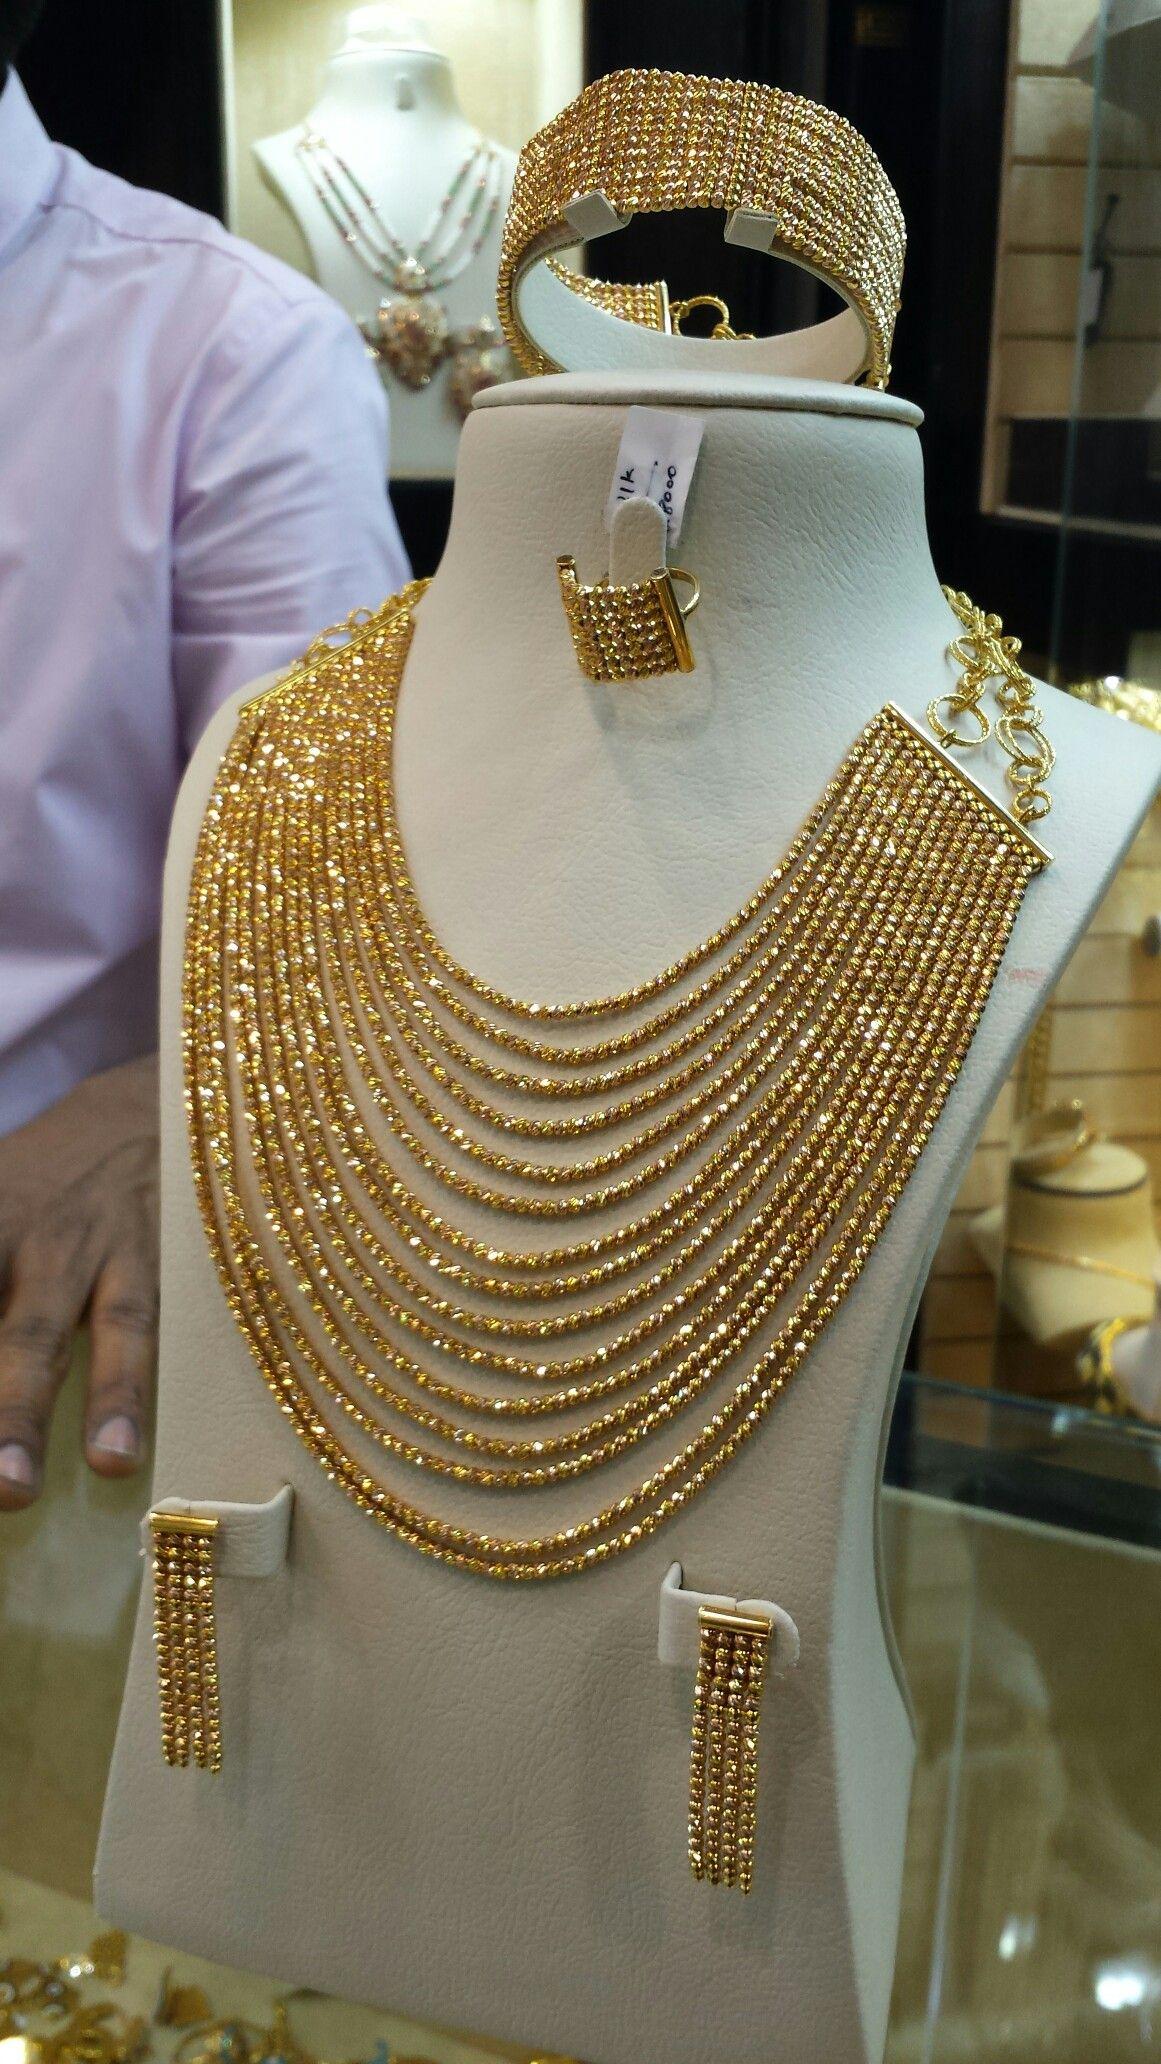 Pin By Bina Shah On Jewellery Stylish Jewelry Pinterest Jewelry